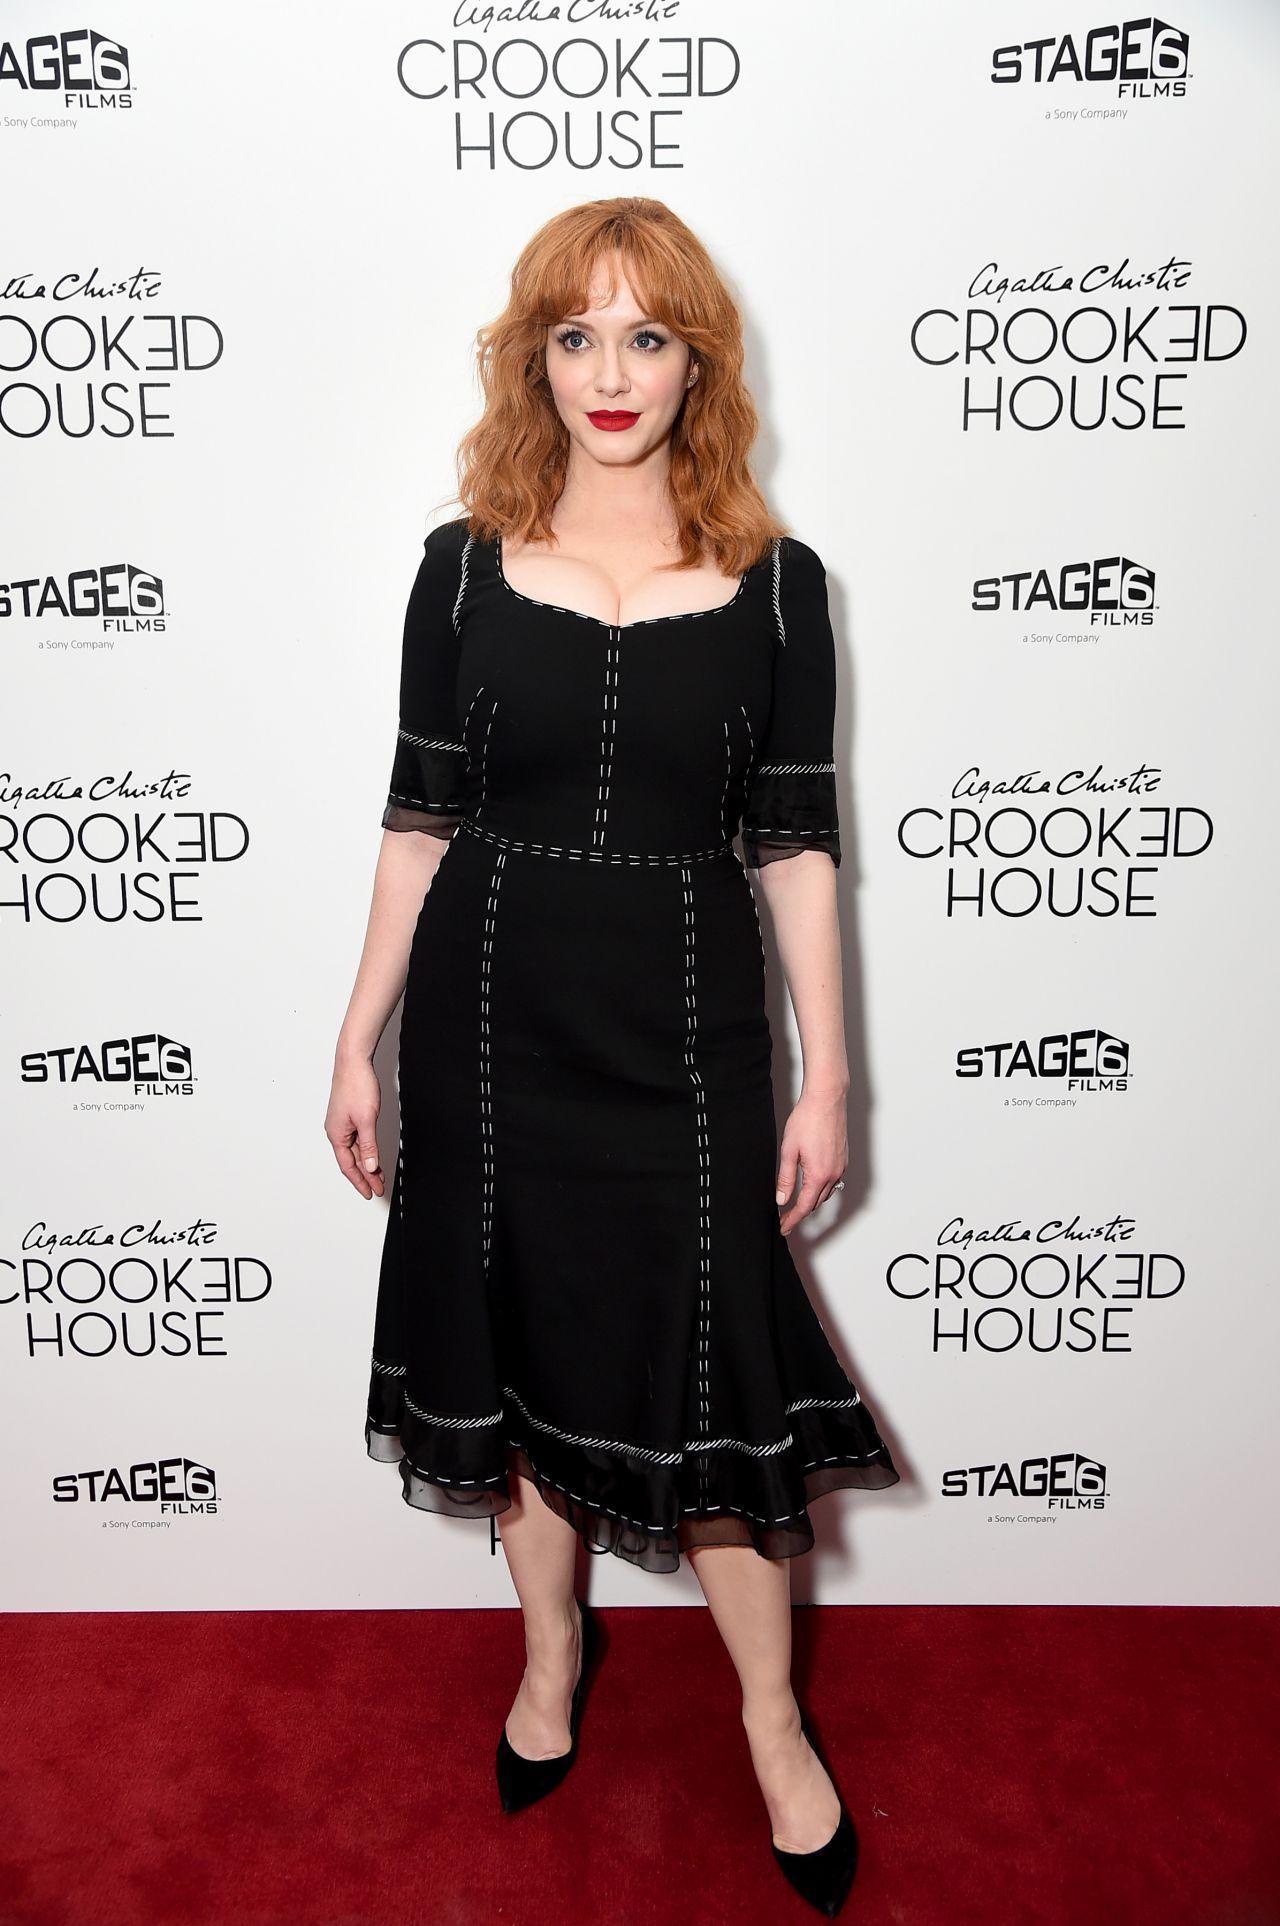 Christina Hendricks Crooked House Premiere At